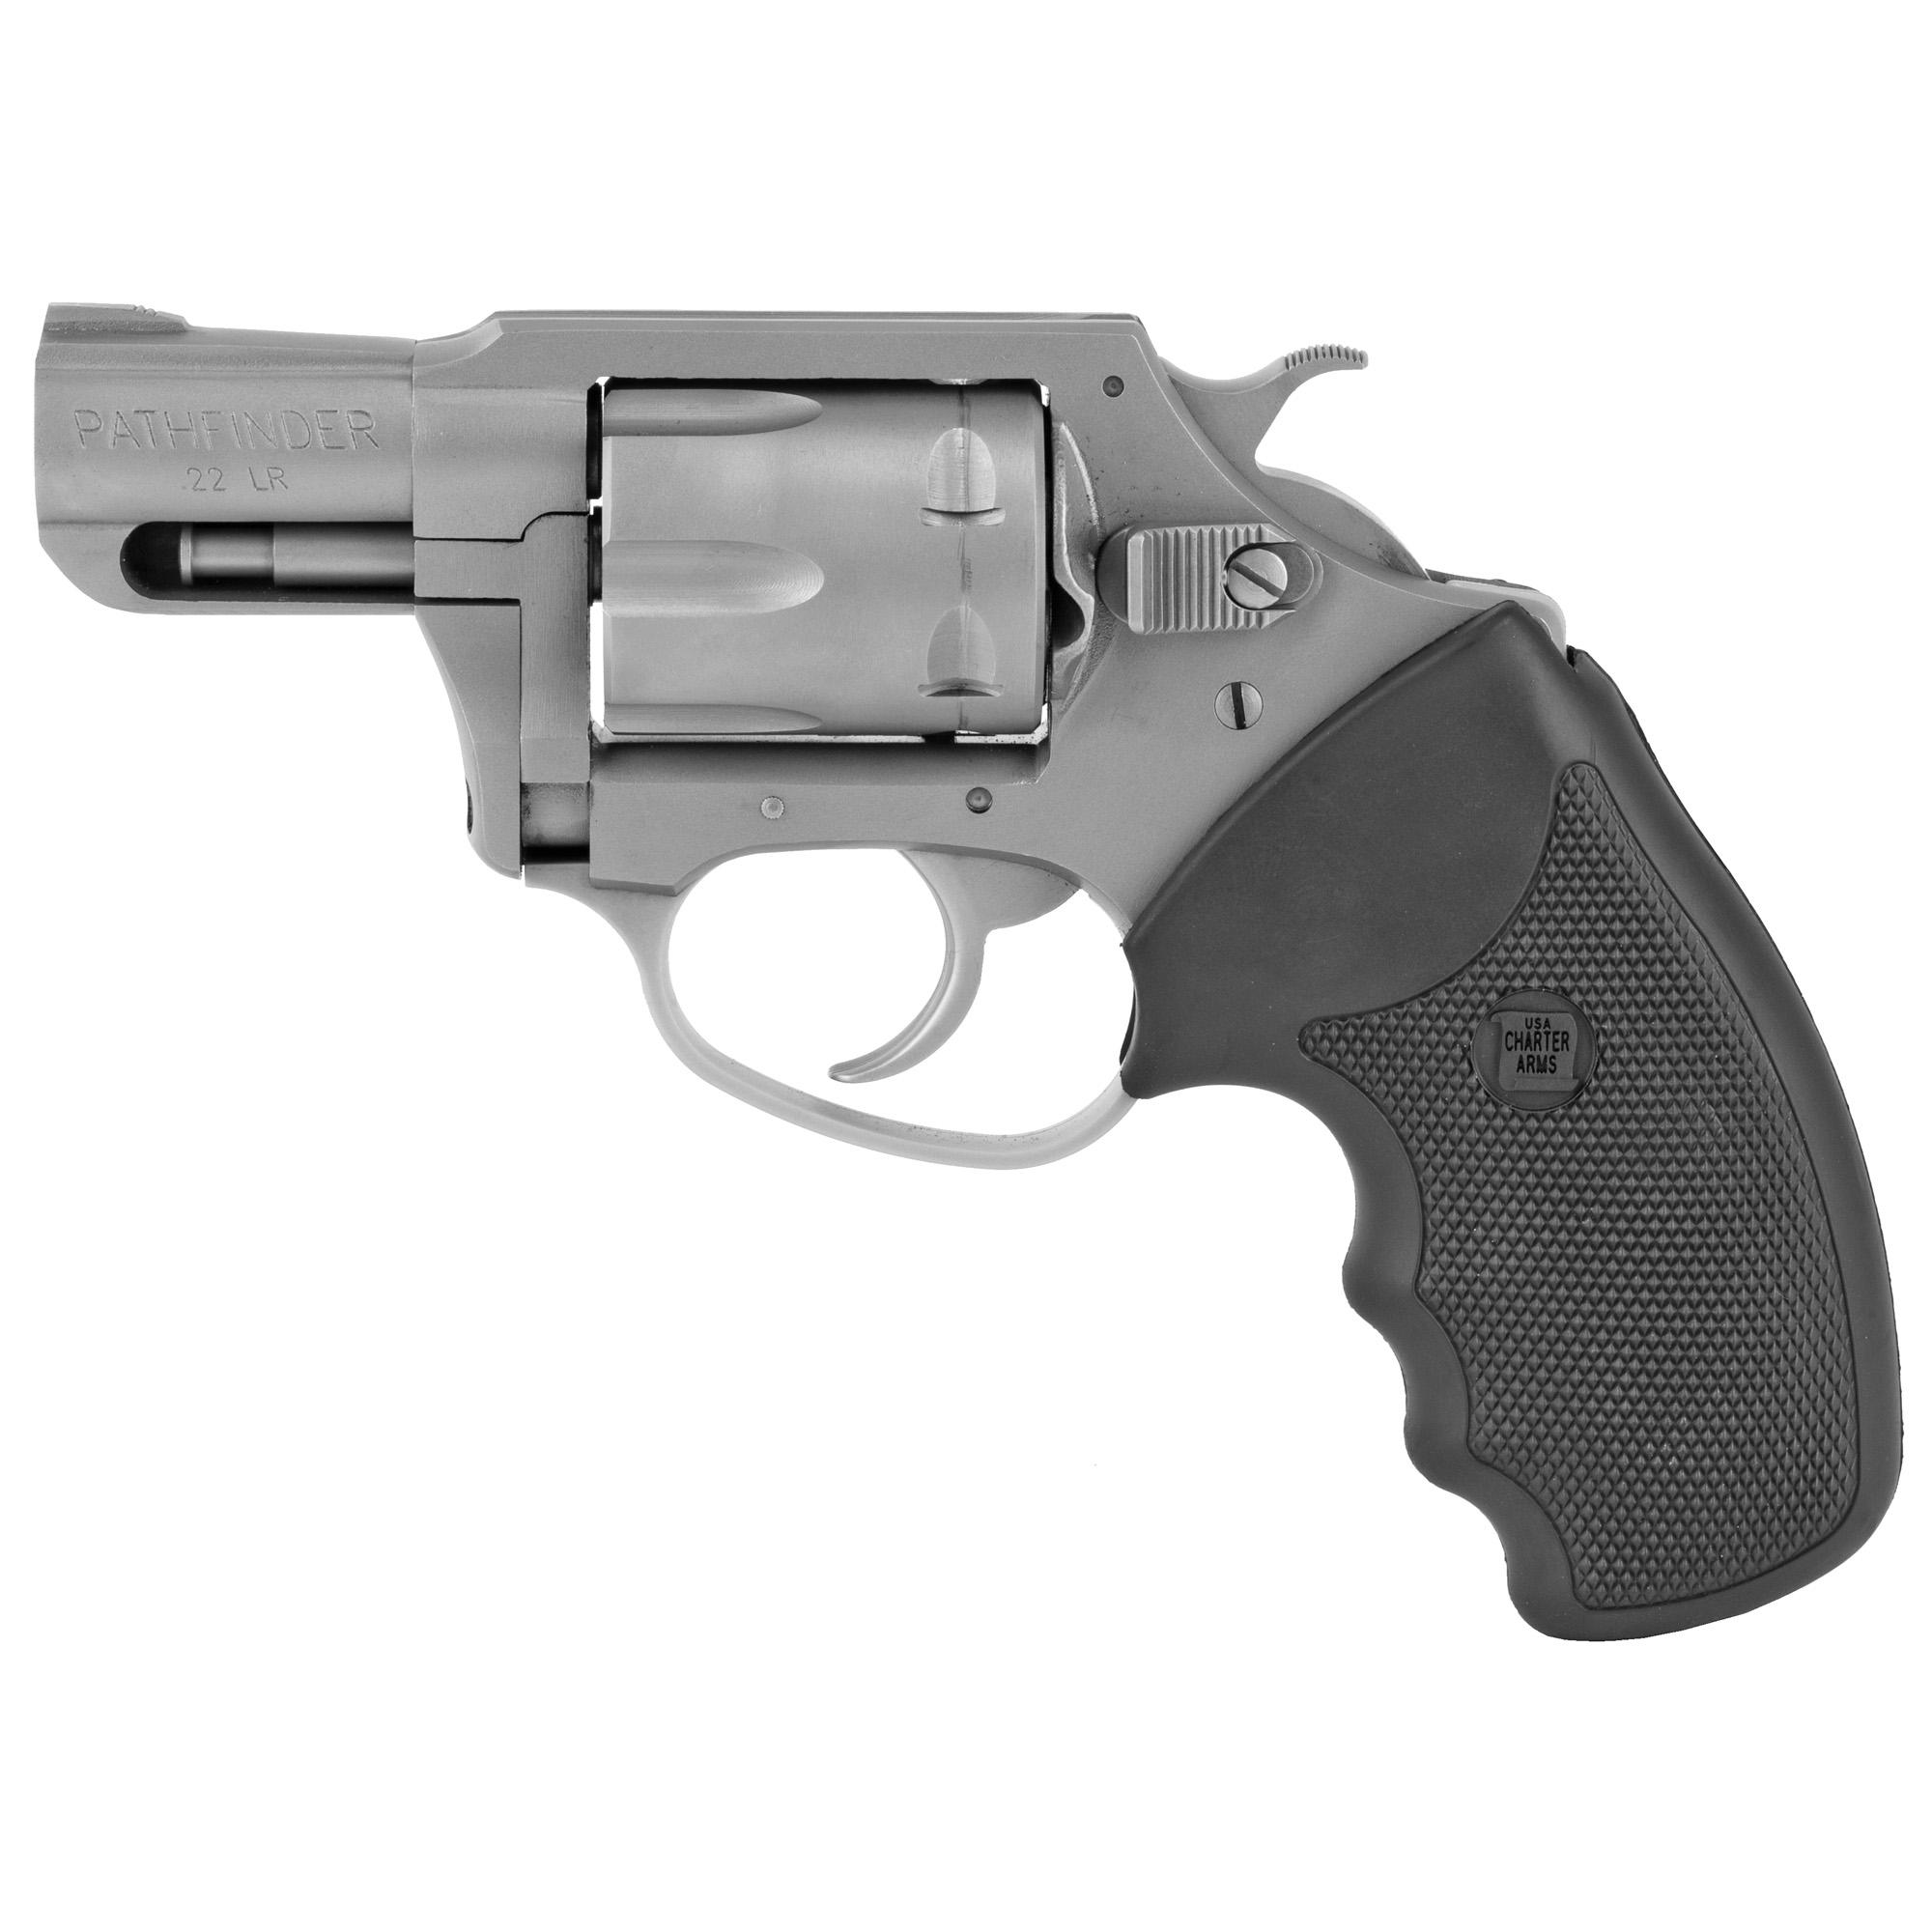 "Charter Arms Pathfinder 22lr Ss 2"""